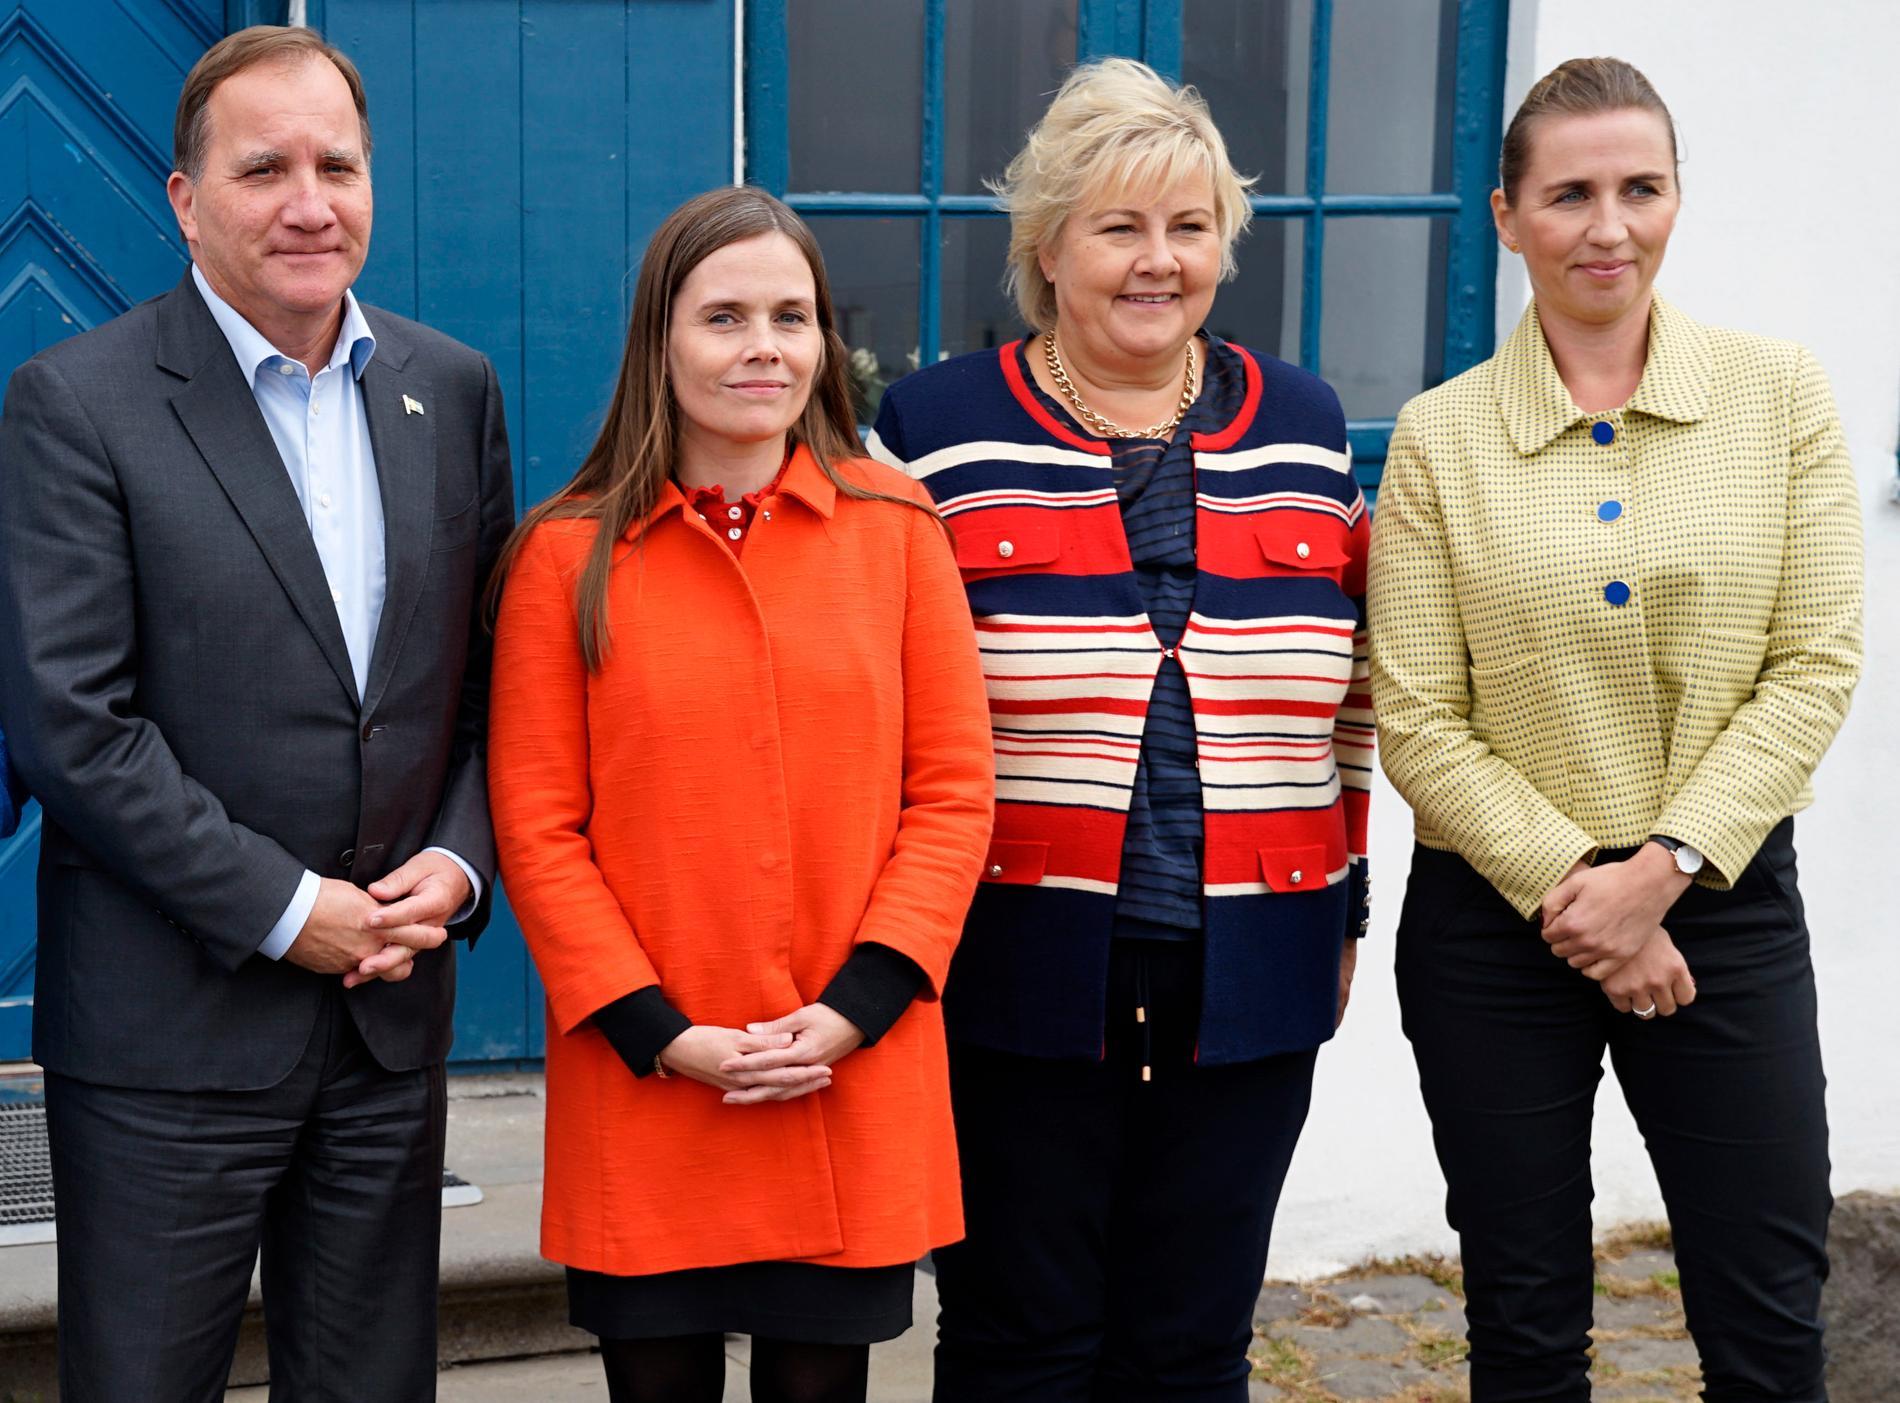 Sveriges Stefan Löfven, Islands Katrin Jakobsdottir, Norges Erna Solberg och Danmarks Mette Frederiksen.